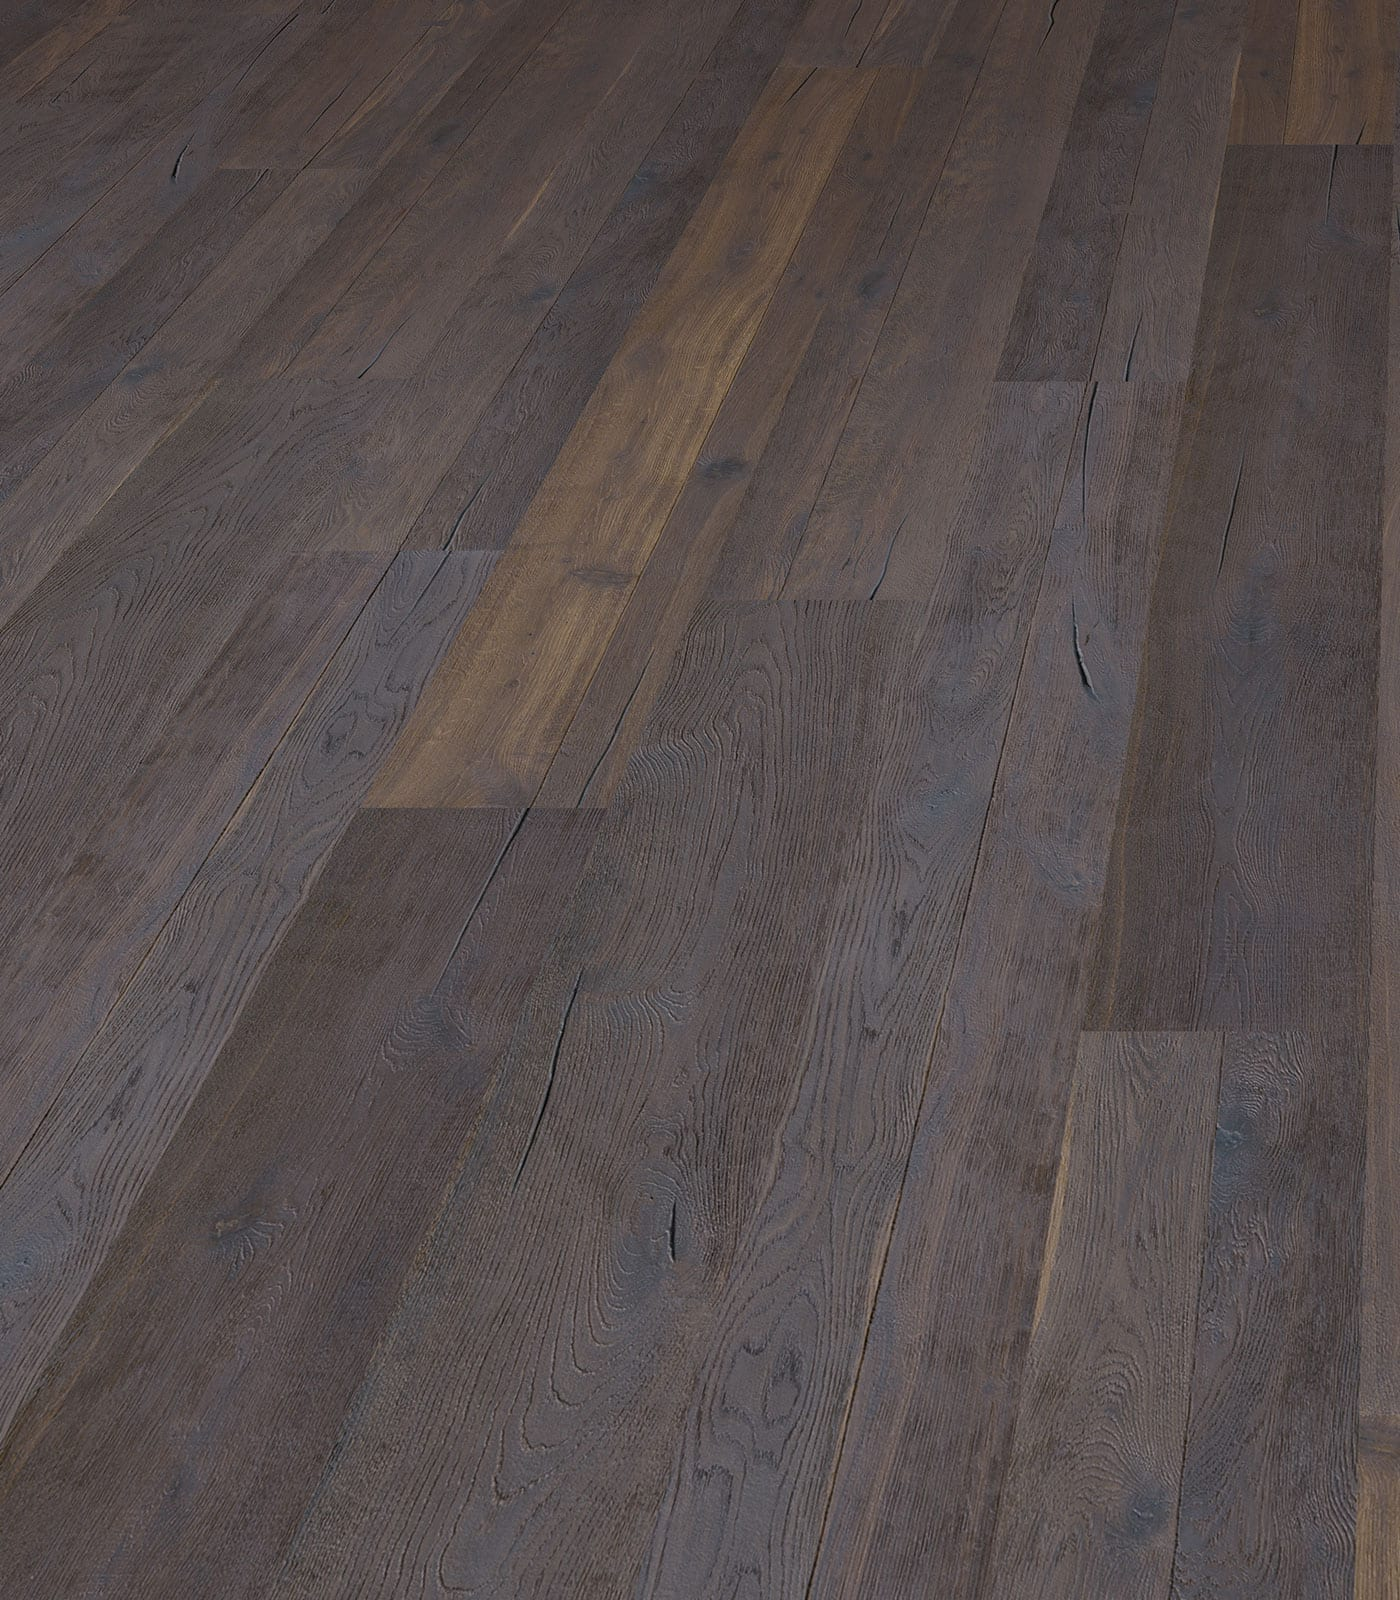 Alhambra-Heritage Collection-European Oak Floors-angle